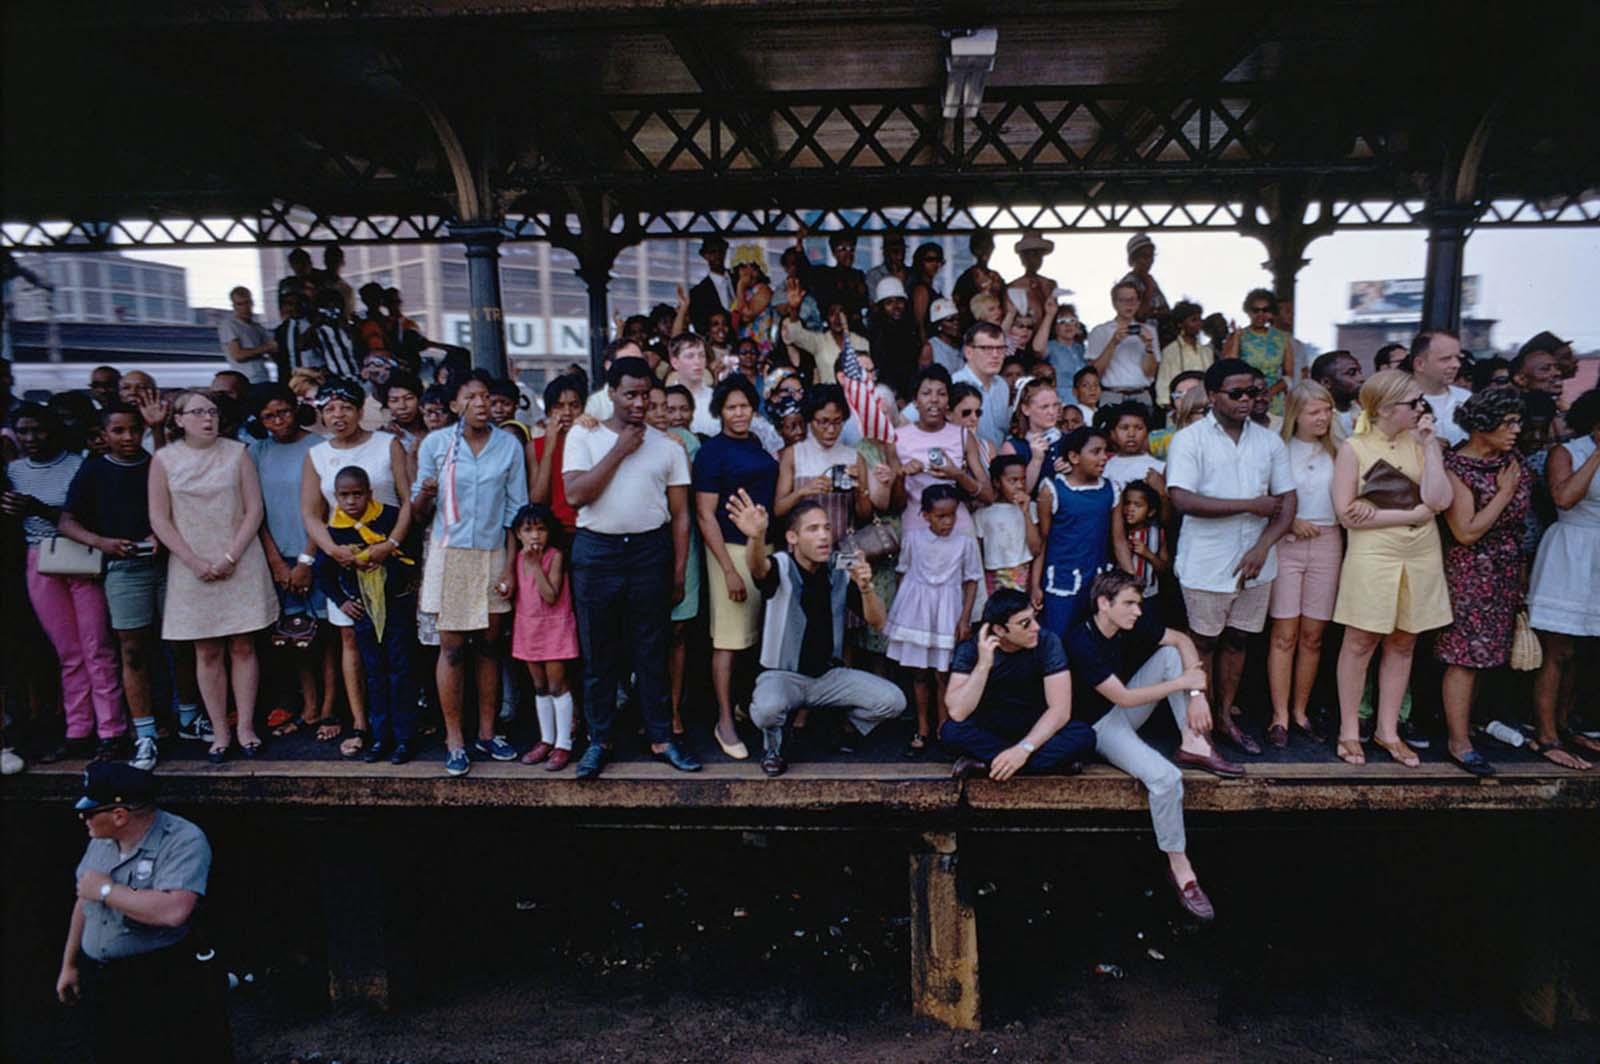 North Philadelphia station on June 8, 1968.